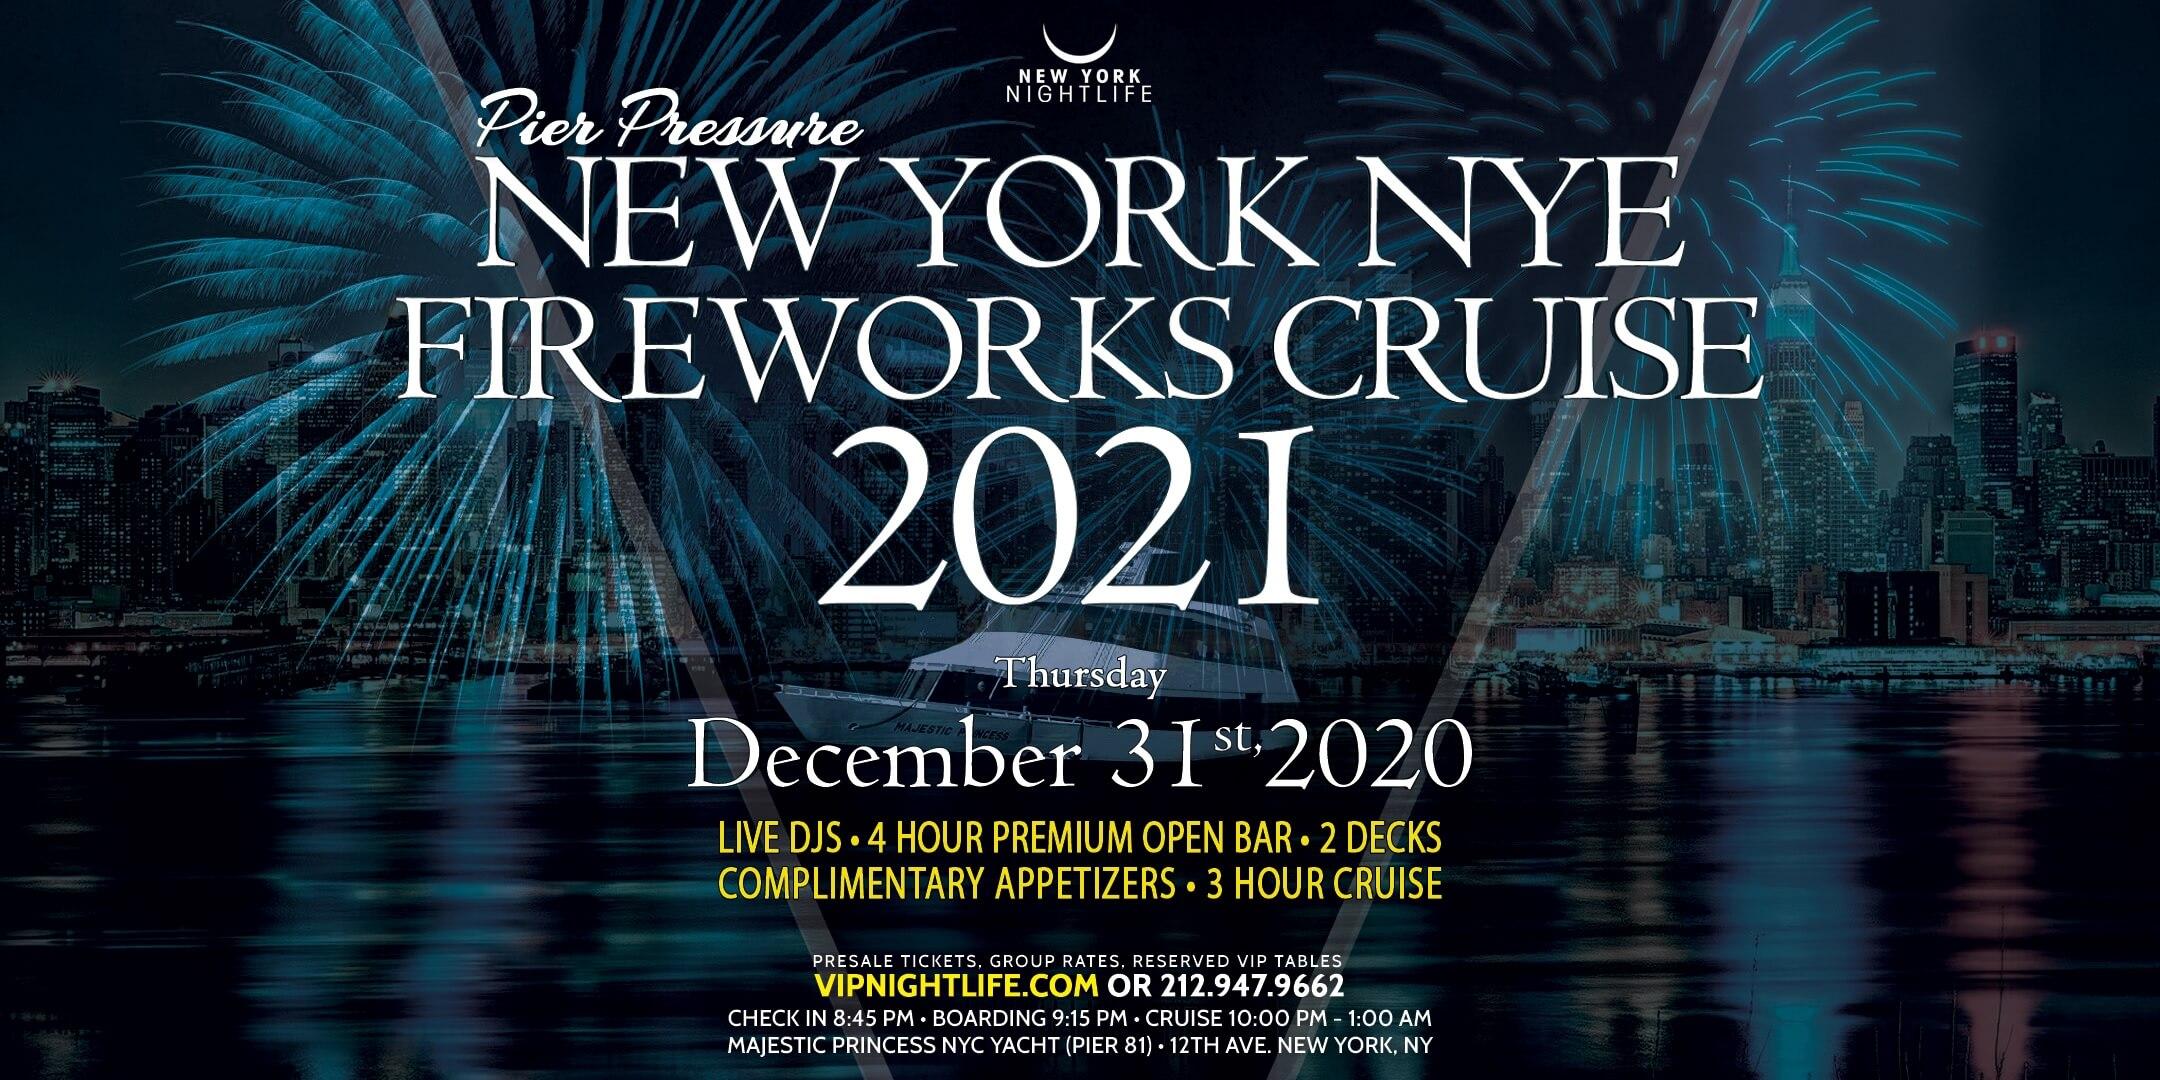 Pier Pressure New York New Year's Eve Fireworks Cruise 2021 - VipNightlife